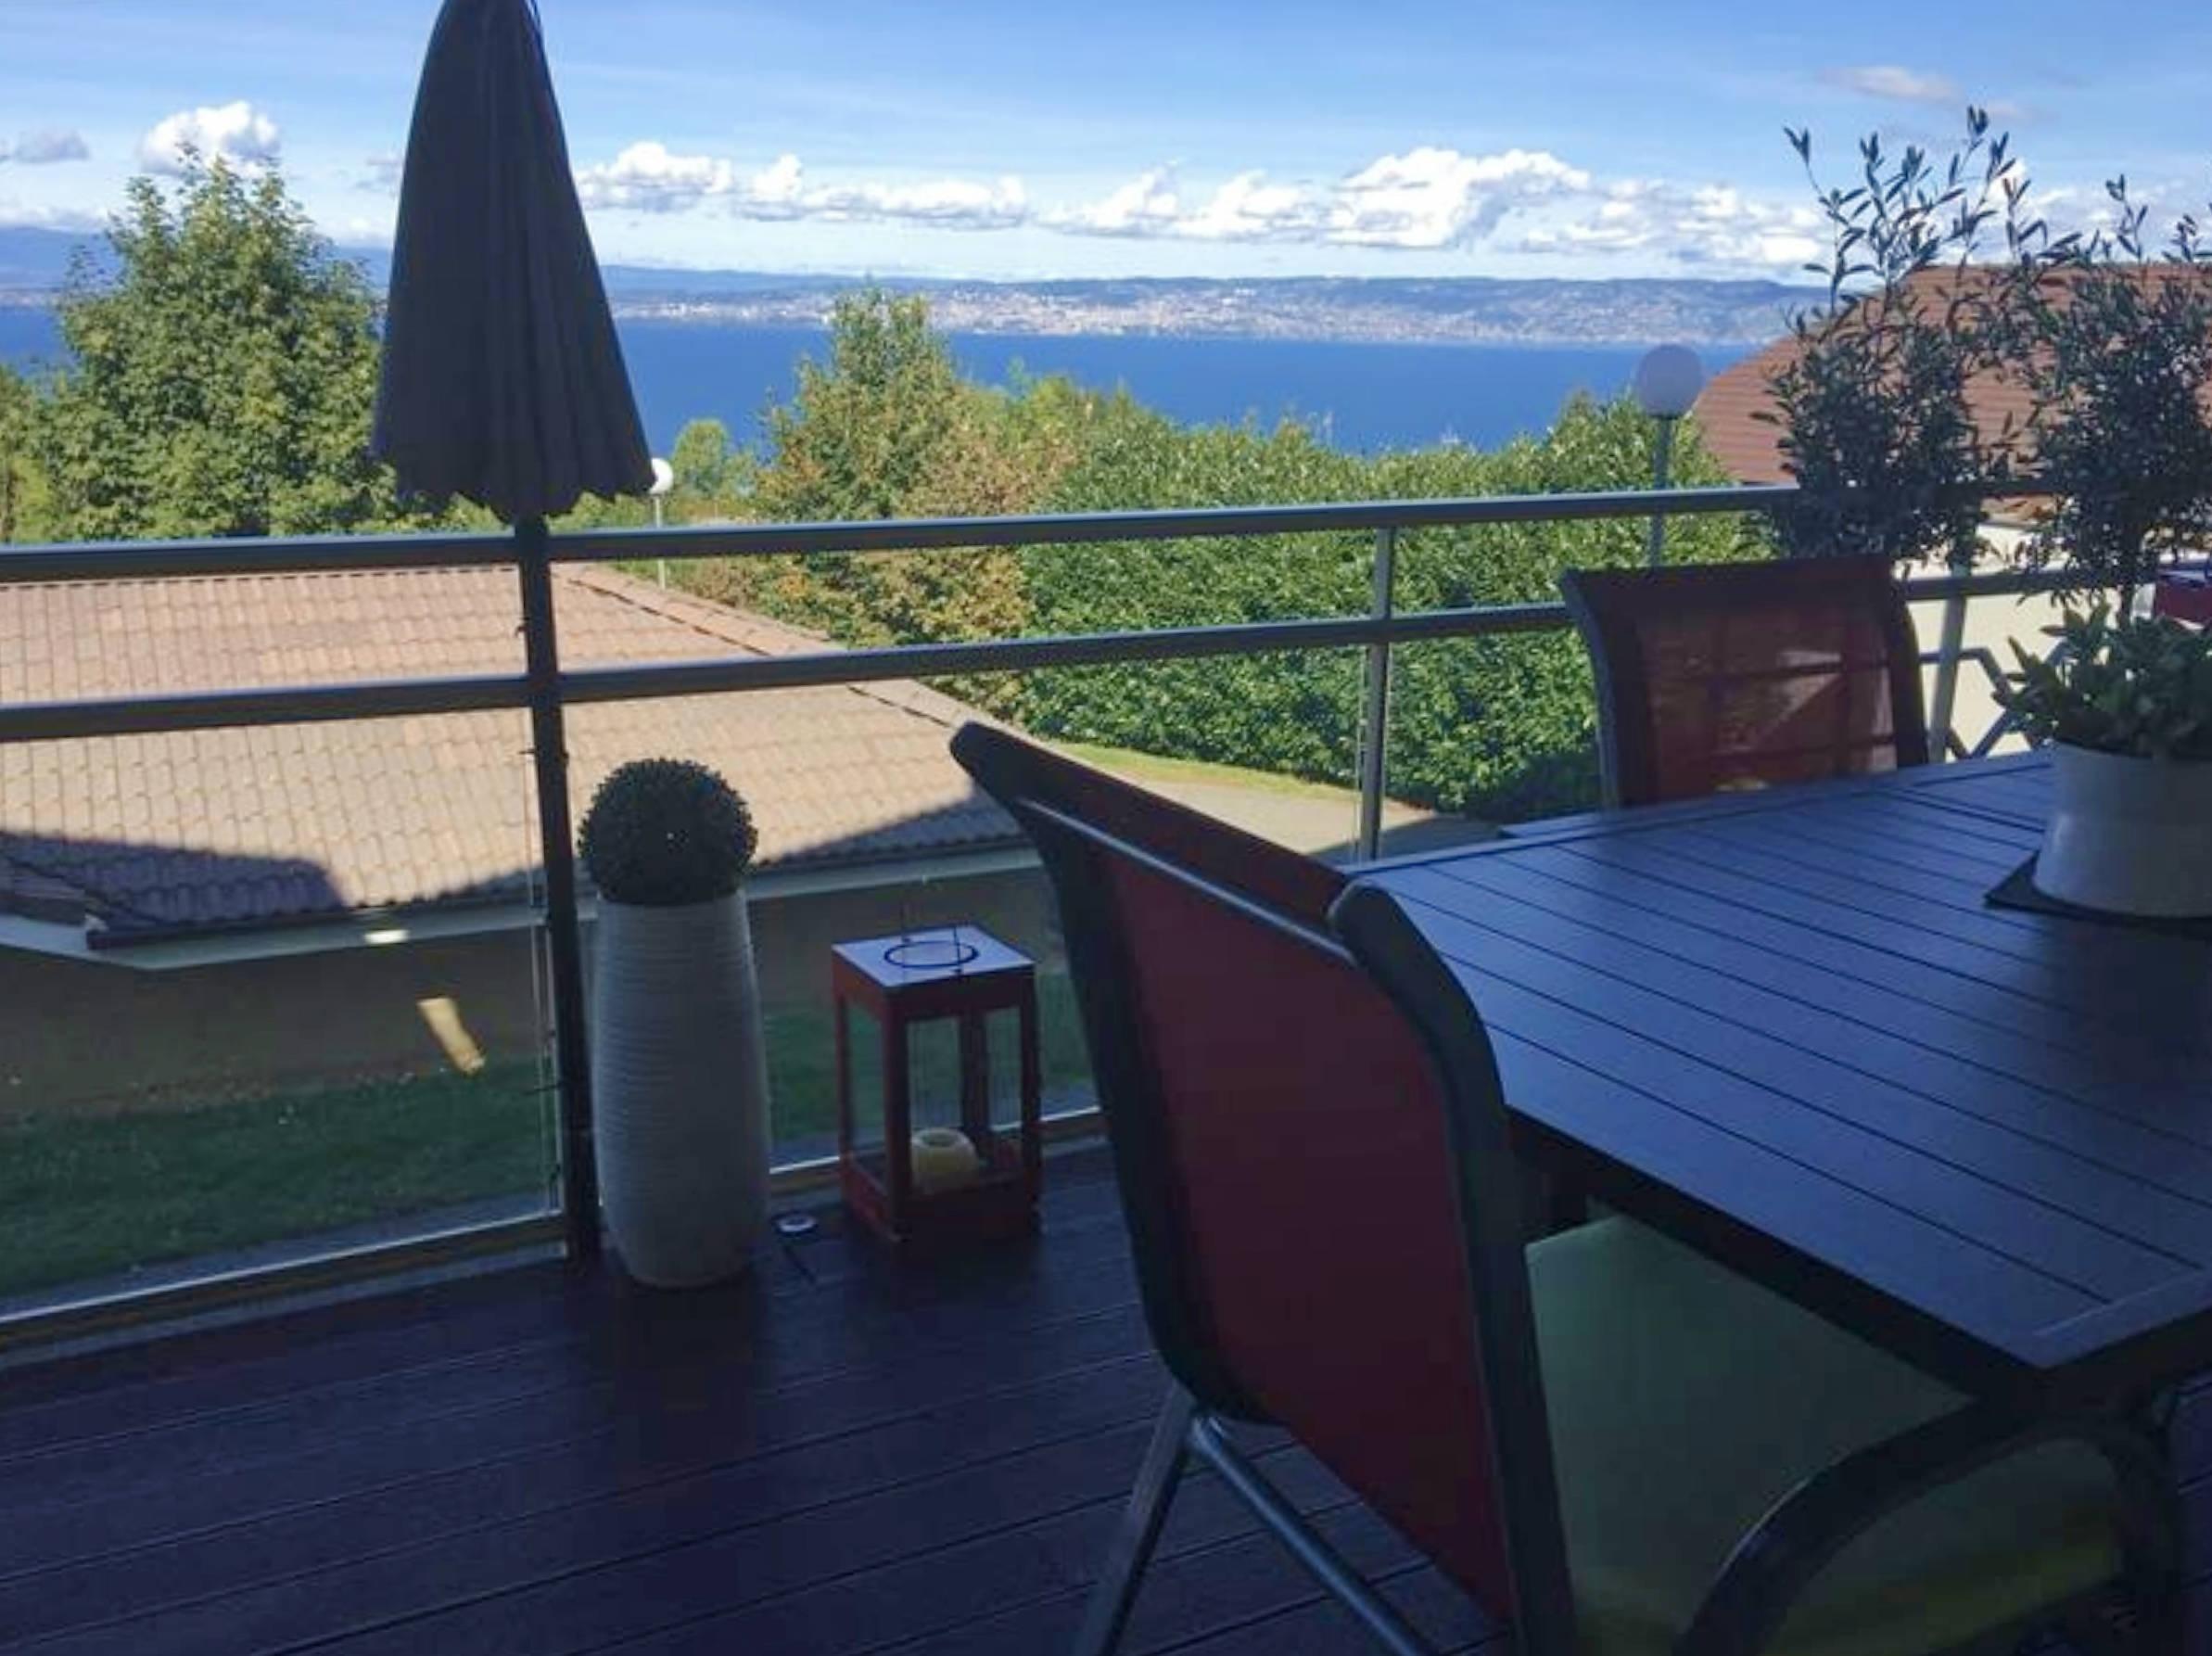 Real Estate in Evian-les-Bains Lake Geneva France